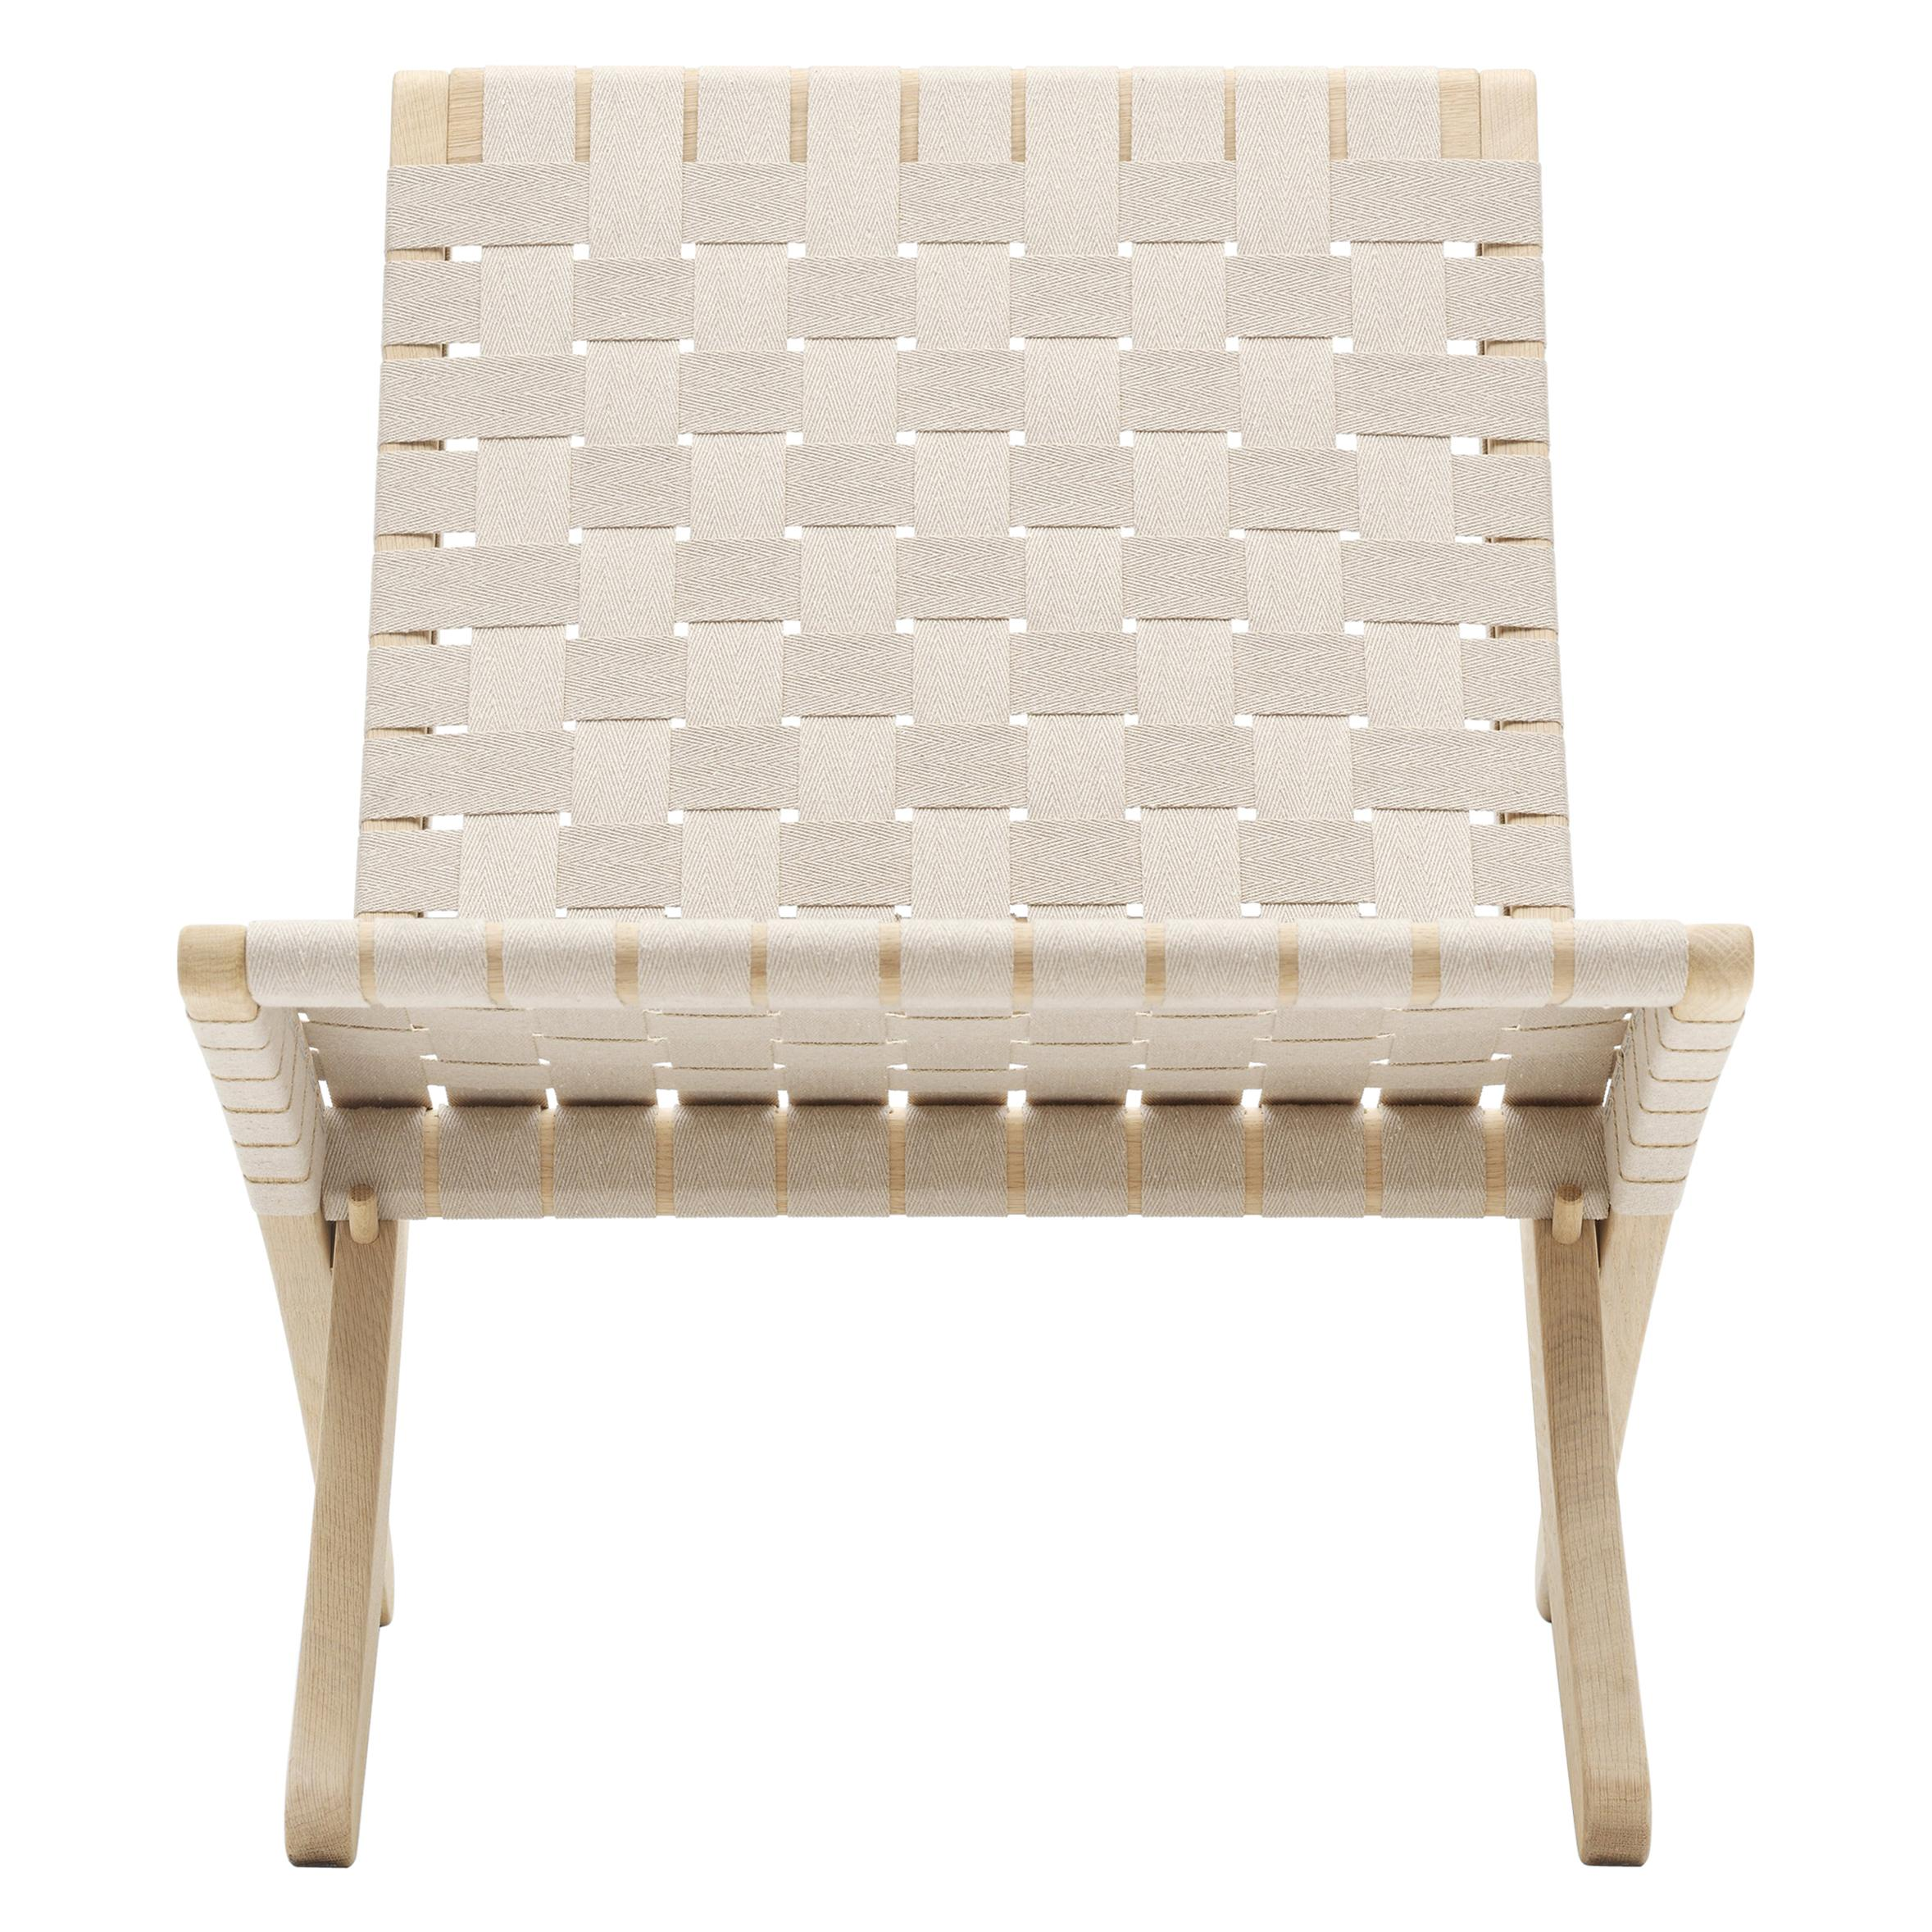 MG501 Cuba Chair in Natural Cotton Webbing by Morten Gøttler